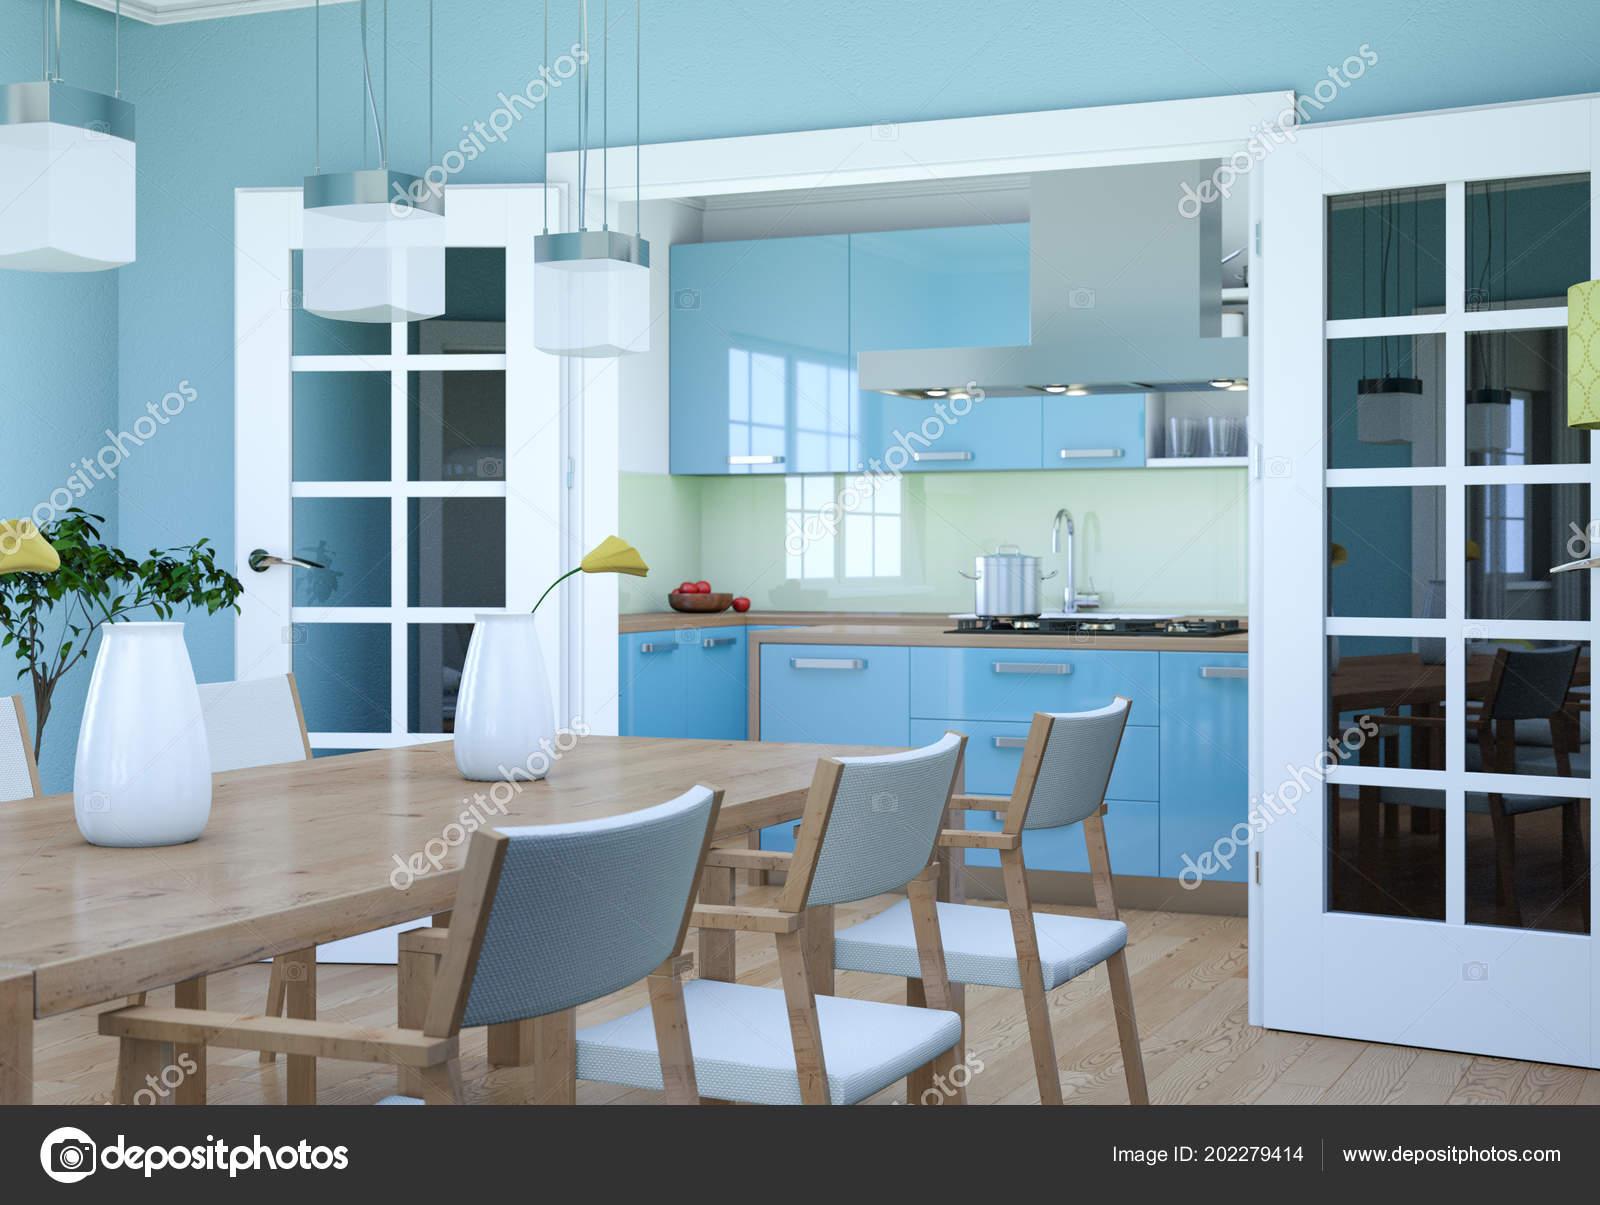 Dise o interiores sala comedor apartamento moderno for Diseno de interiores sala de estar comedor